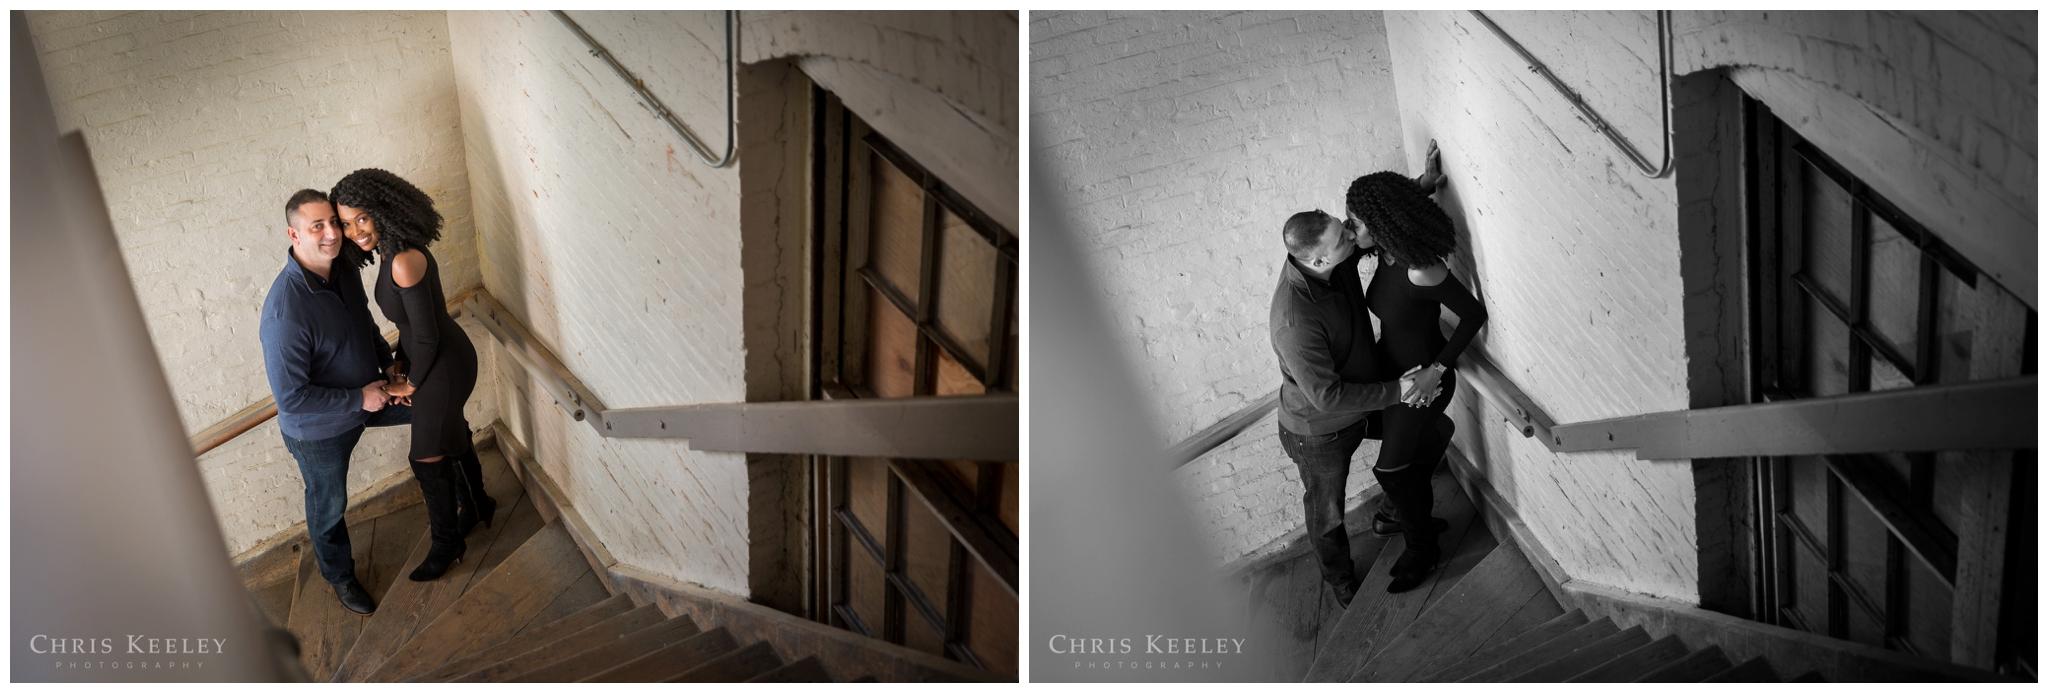 chris-keeley-photography-dover-new-hampshire-engagement-wedding-05.jpg